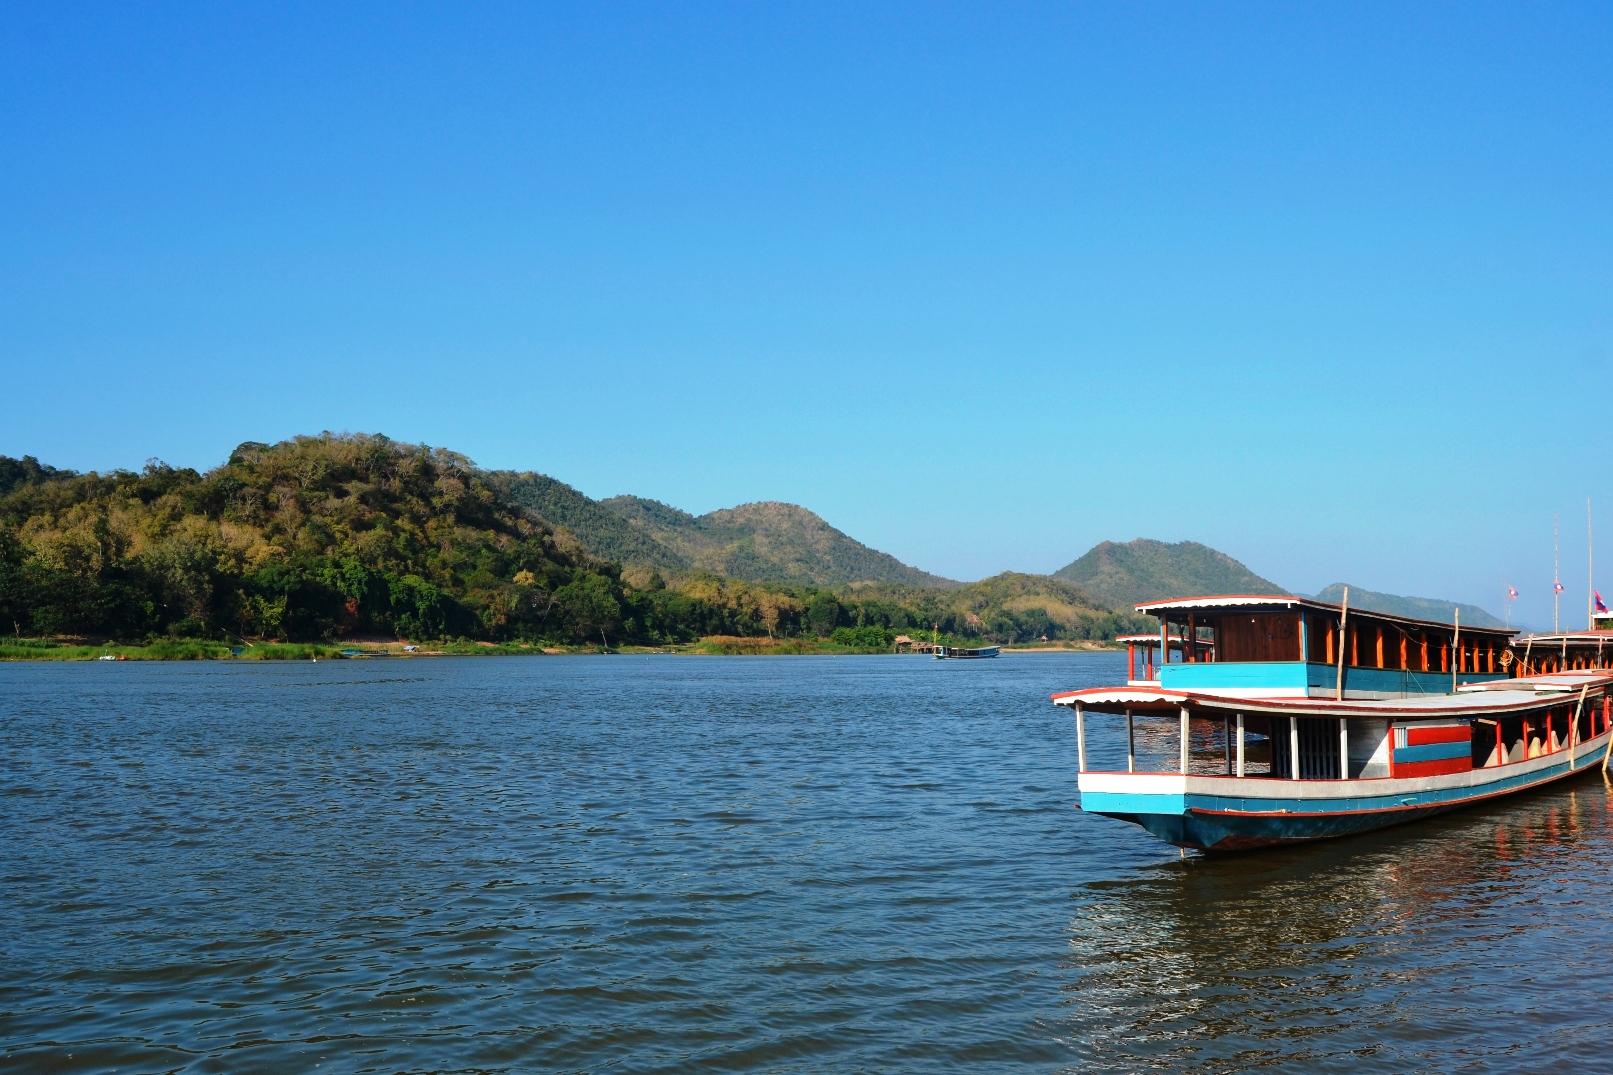 2019-12-laos-luang-prabang-chomphet-1-cruzando